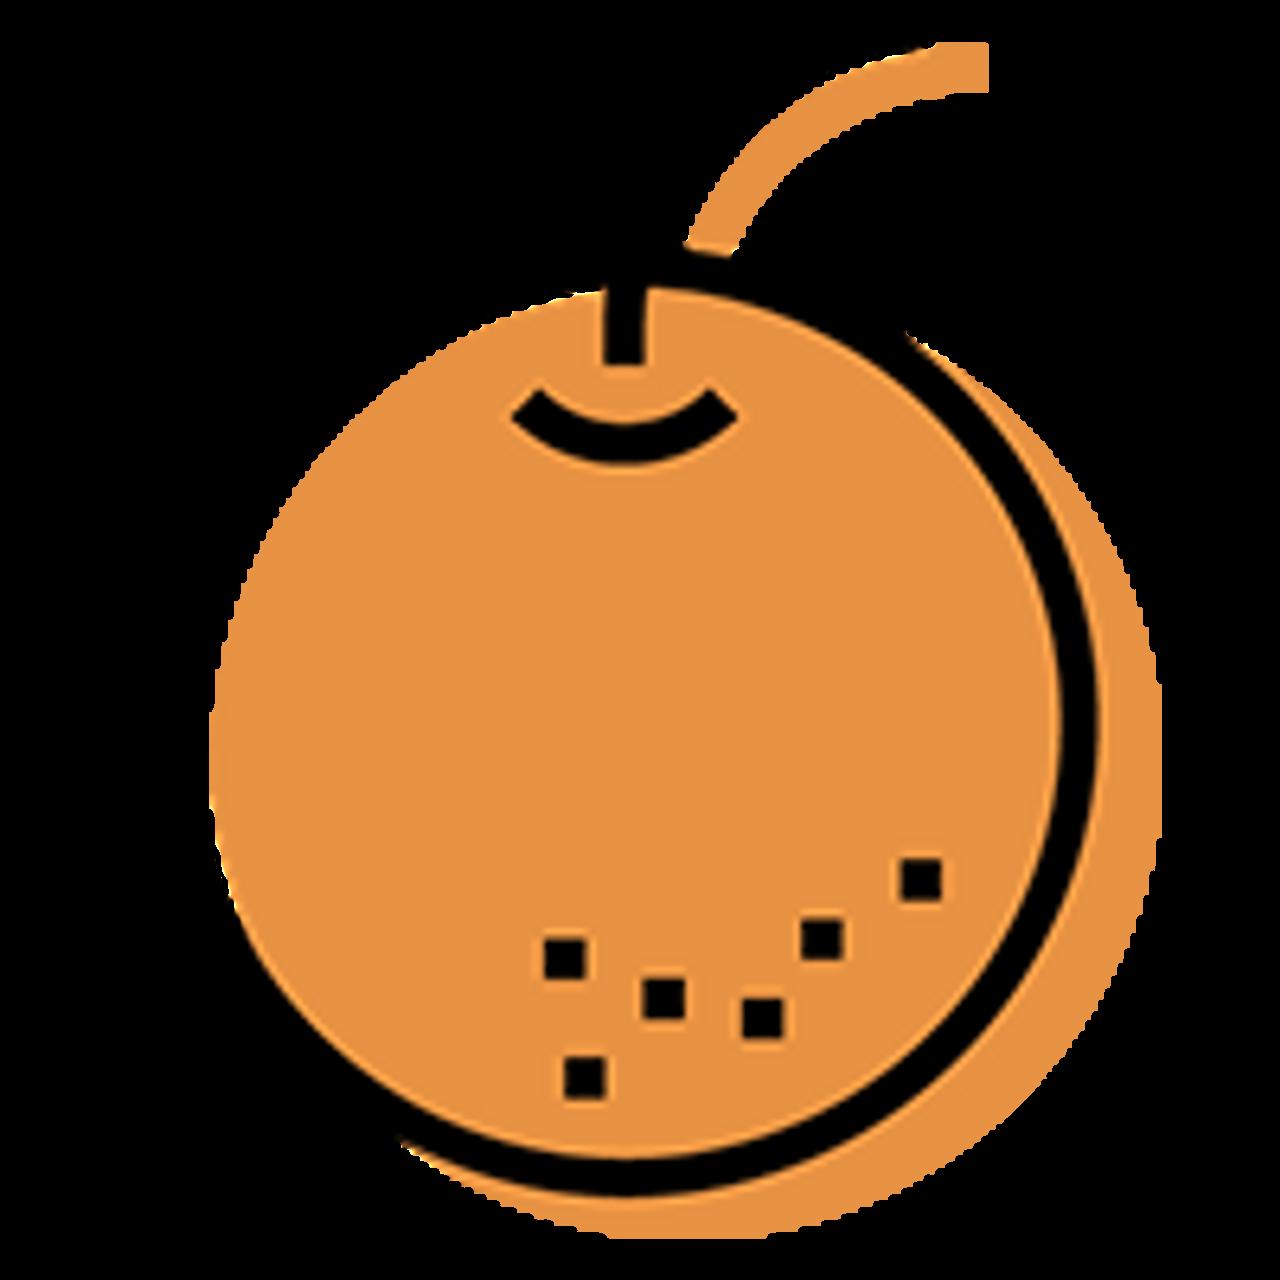 Orange Flavored Coffee